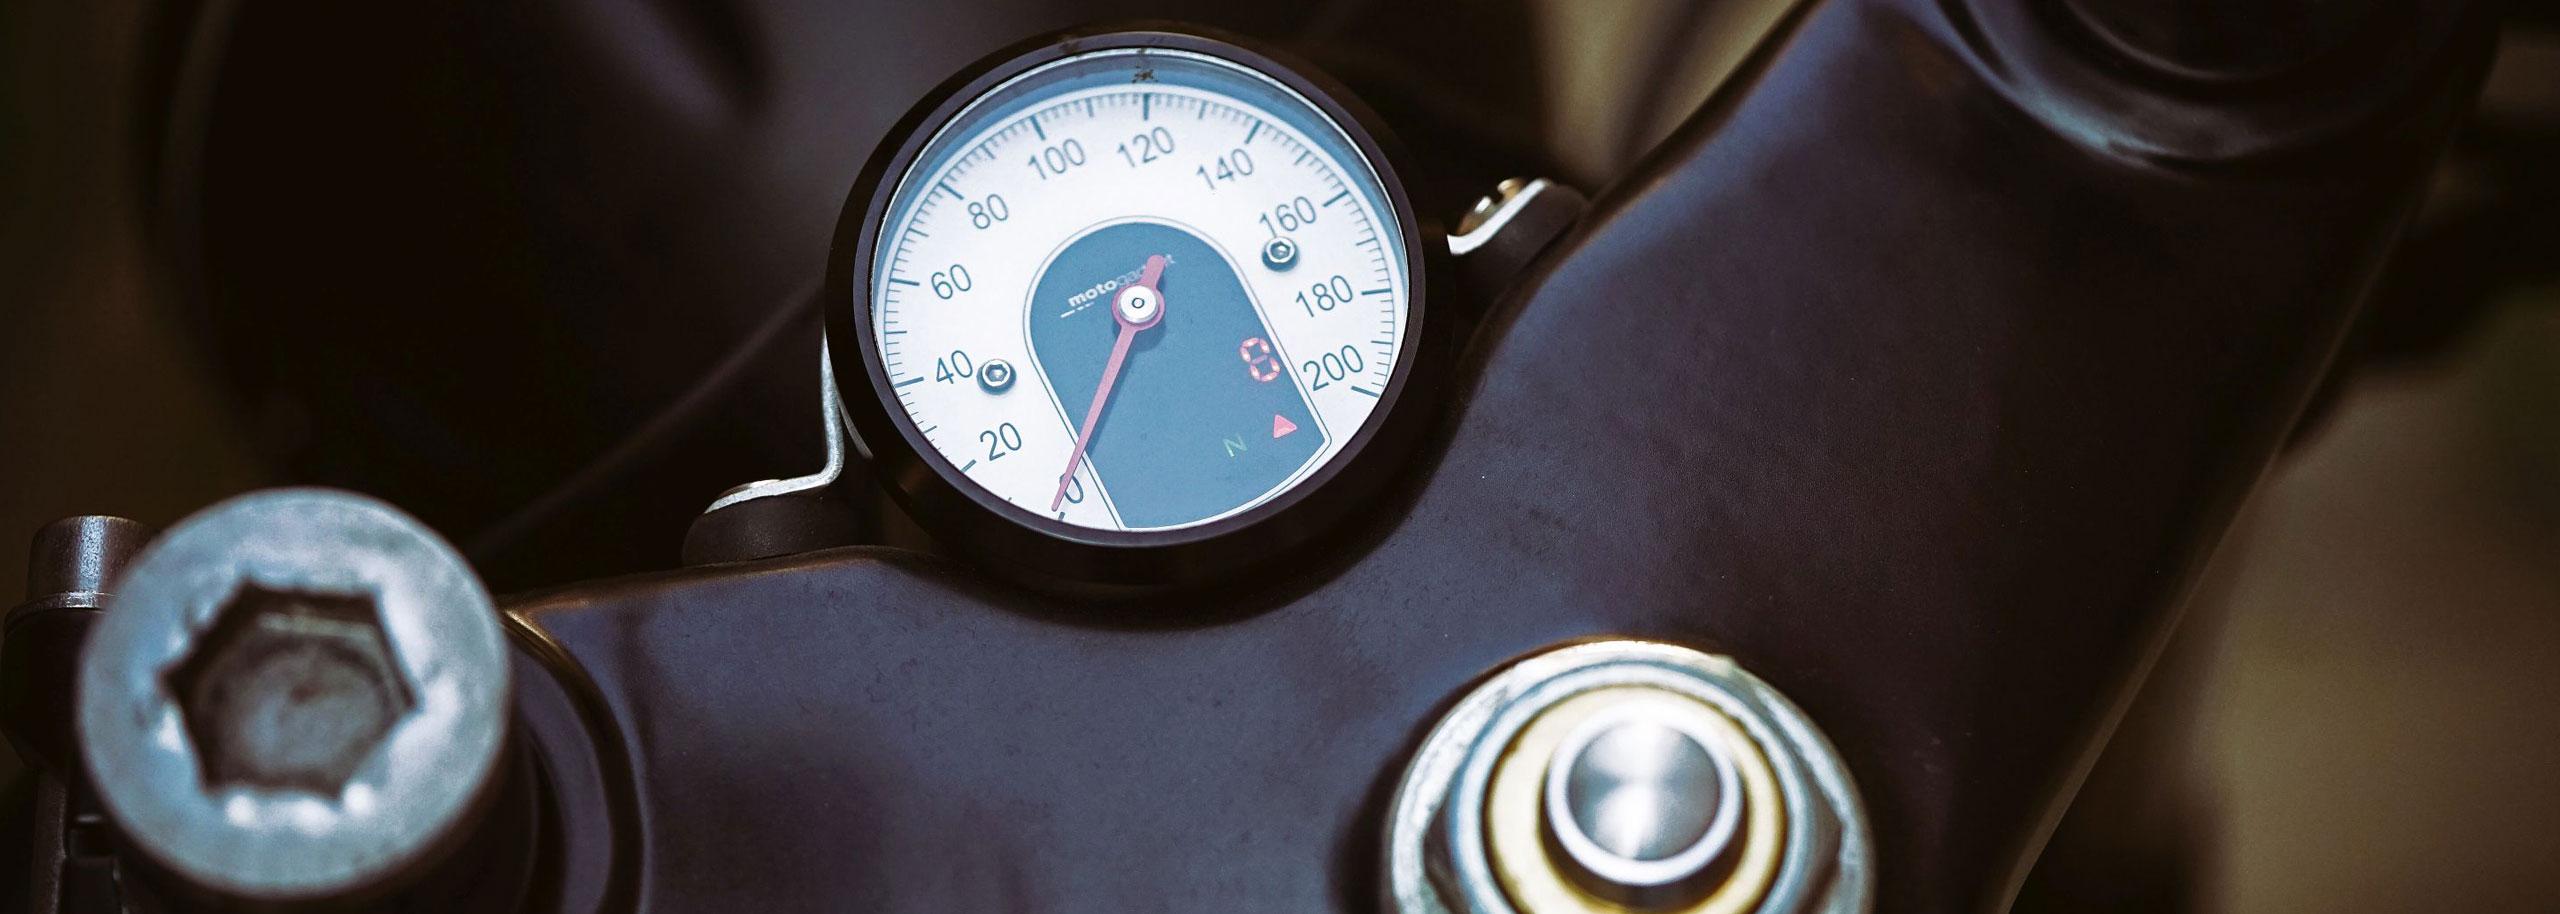 02_TITAN-BLUE-VALENTINE_Honda-Umba-CB-650-Four_Cafe-Racer-Graz-Motorrad-Umbau-Oesterreich-Vintage_Custom-Bikes-Einzigartiges-Design